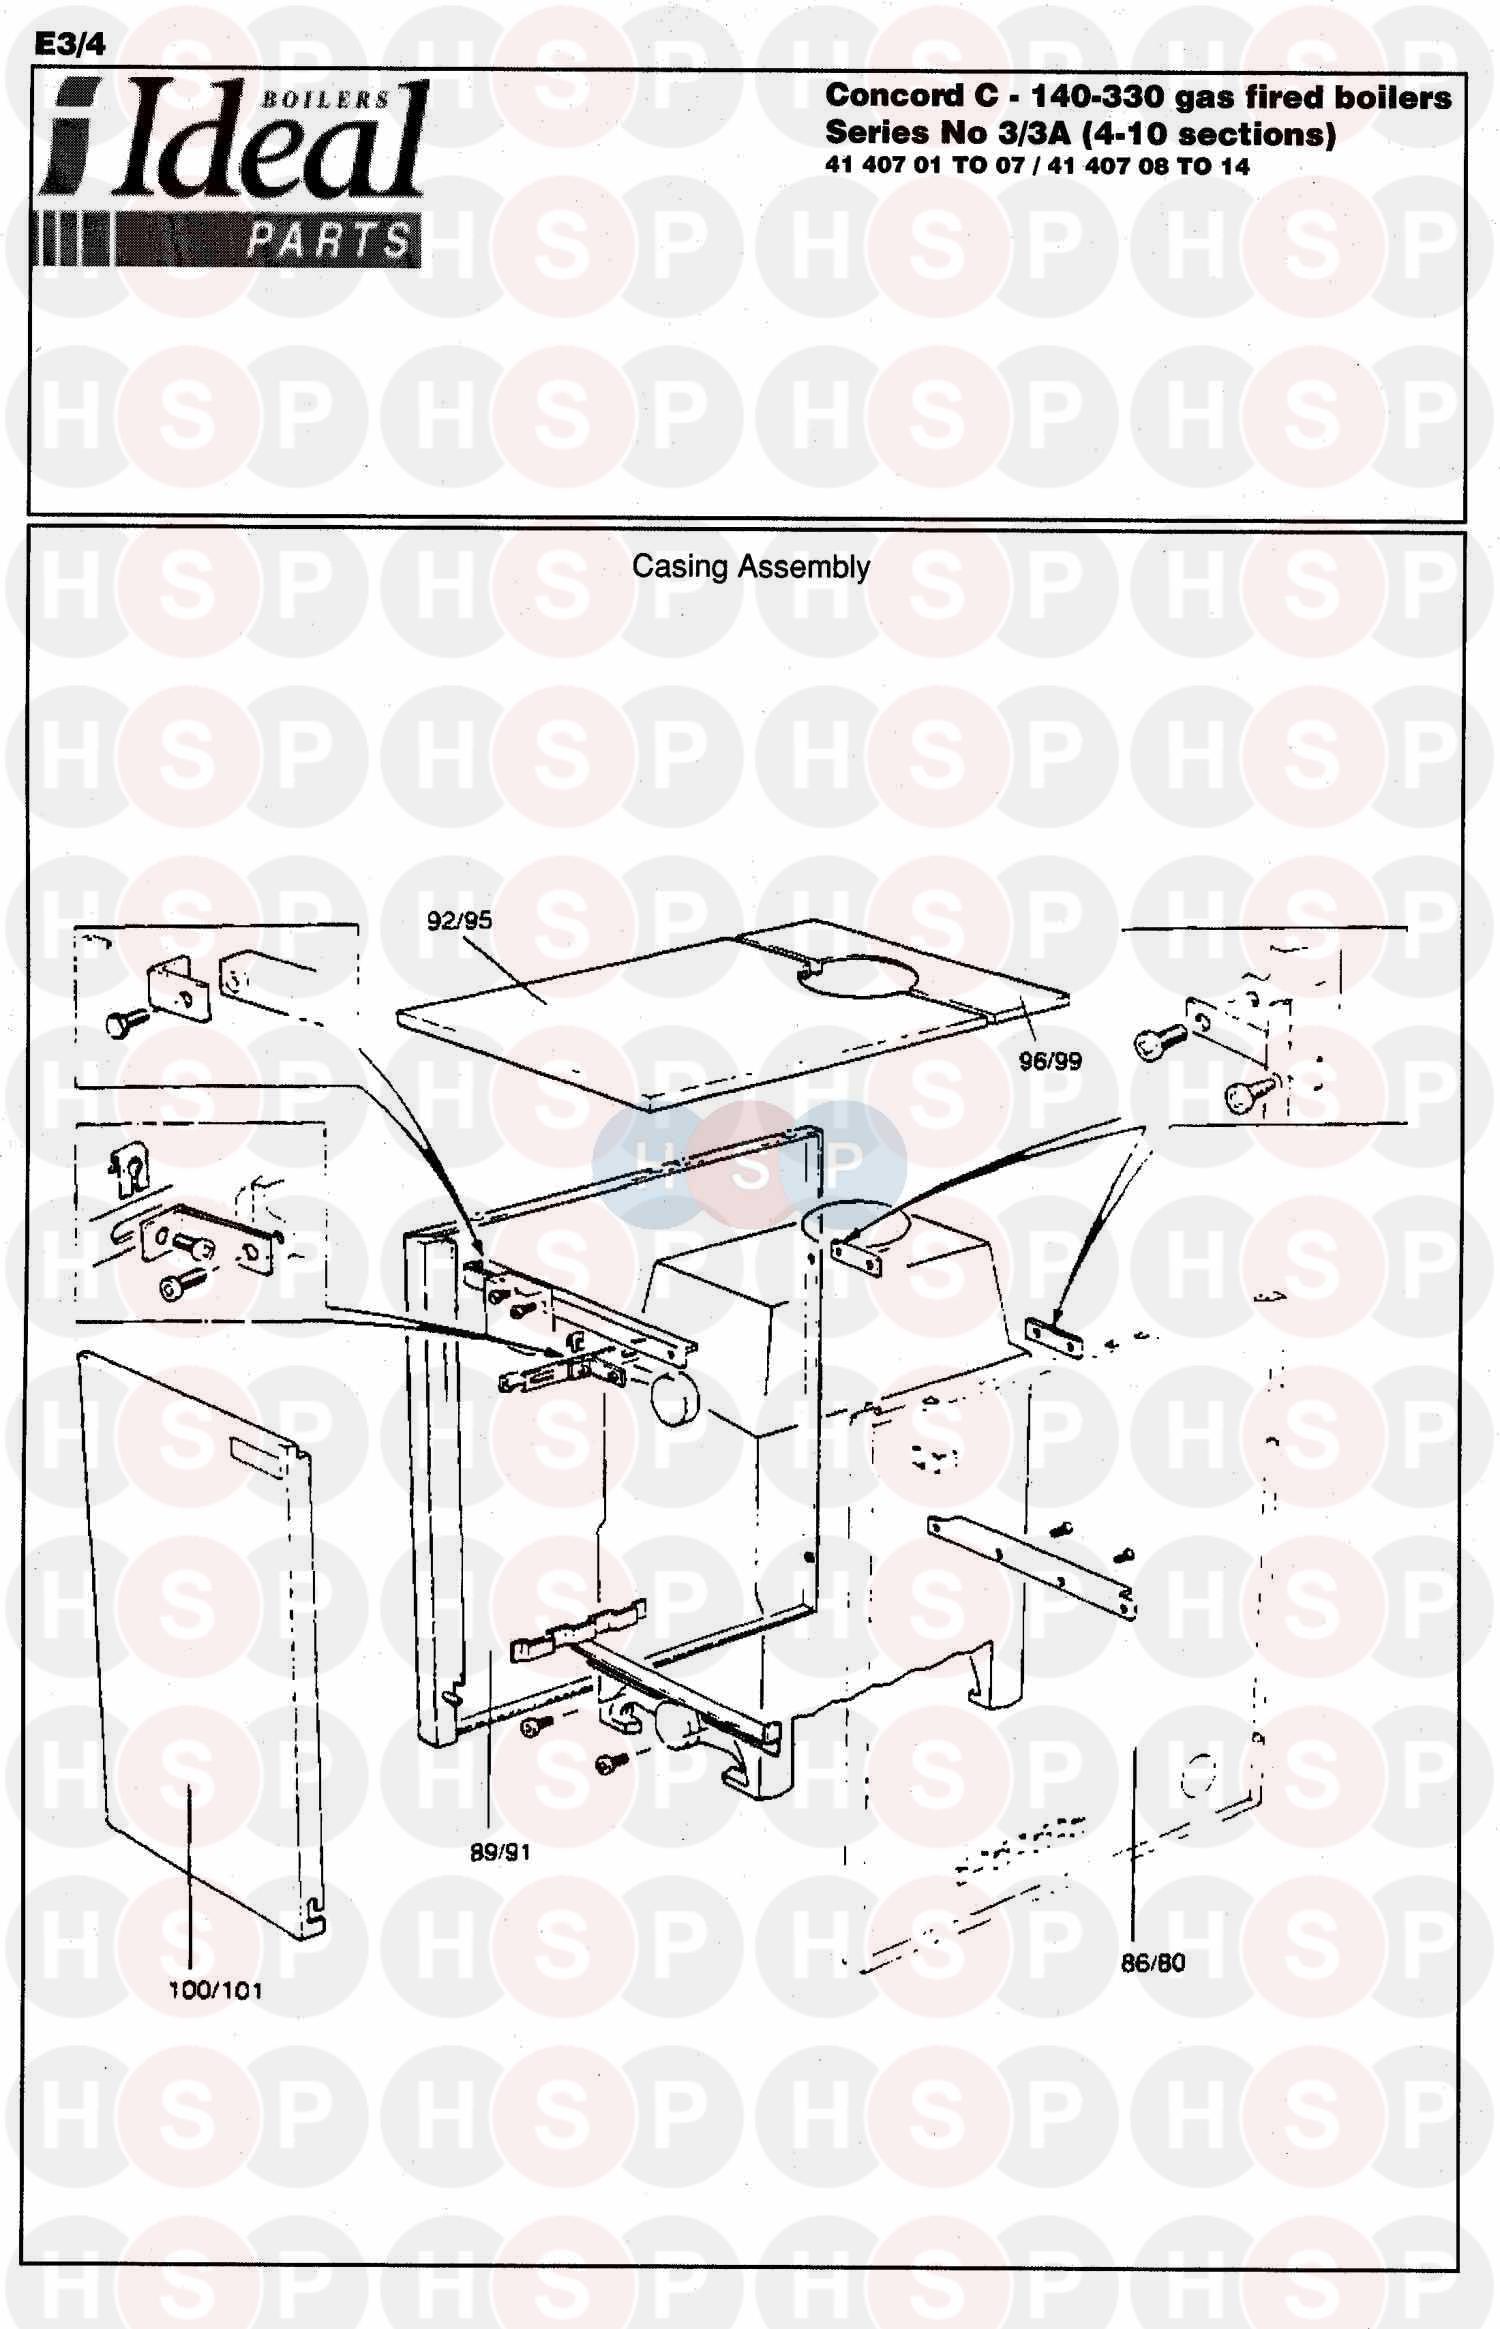 ideal concord c 3a 330 boiler casing diagram heating. Black Bedroom Furniture Sets. Home Design Ideas